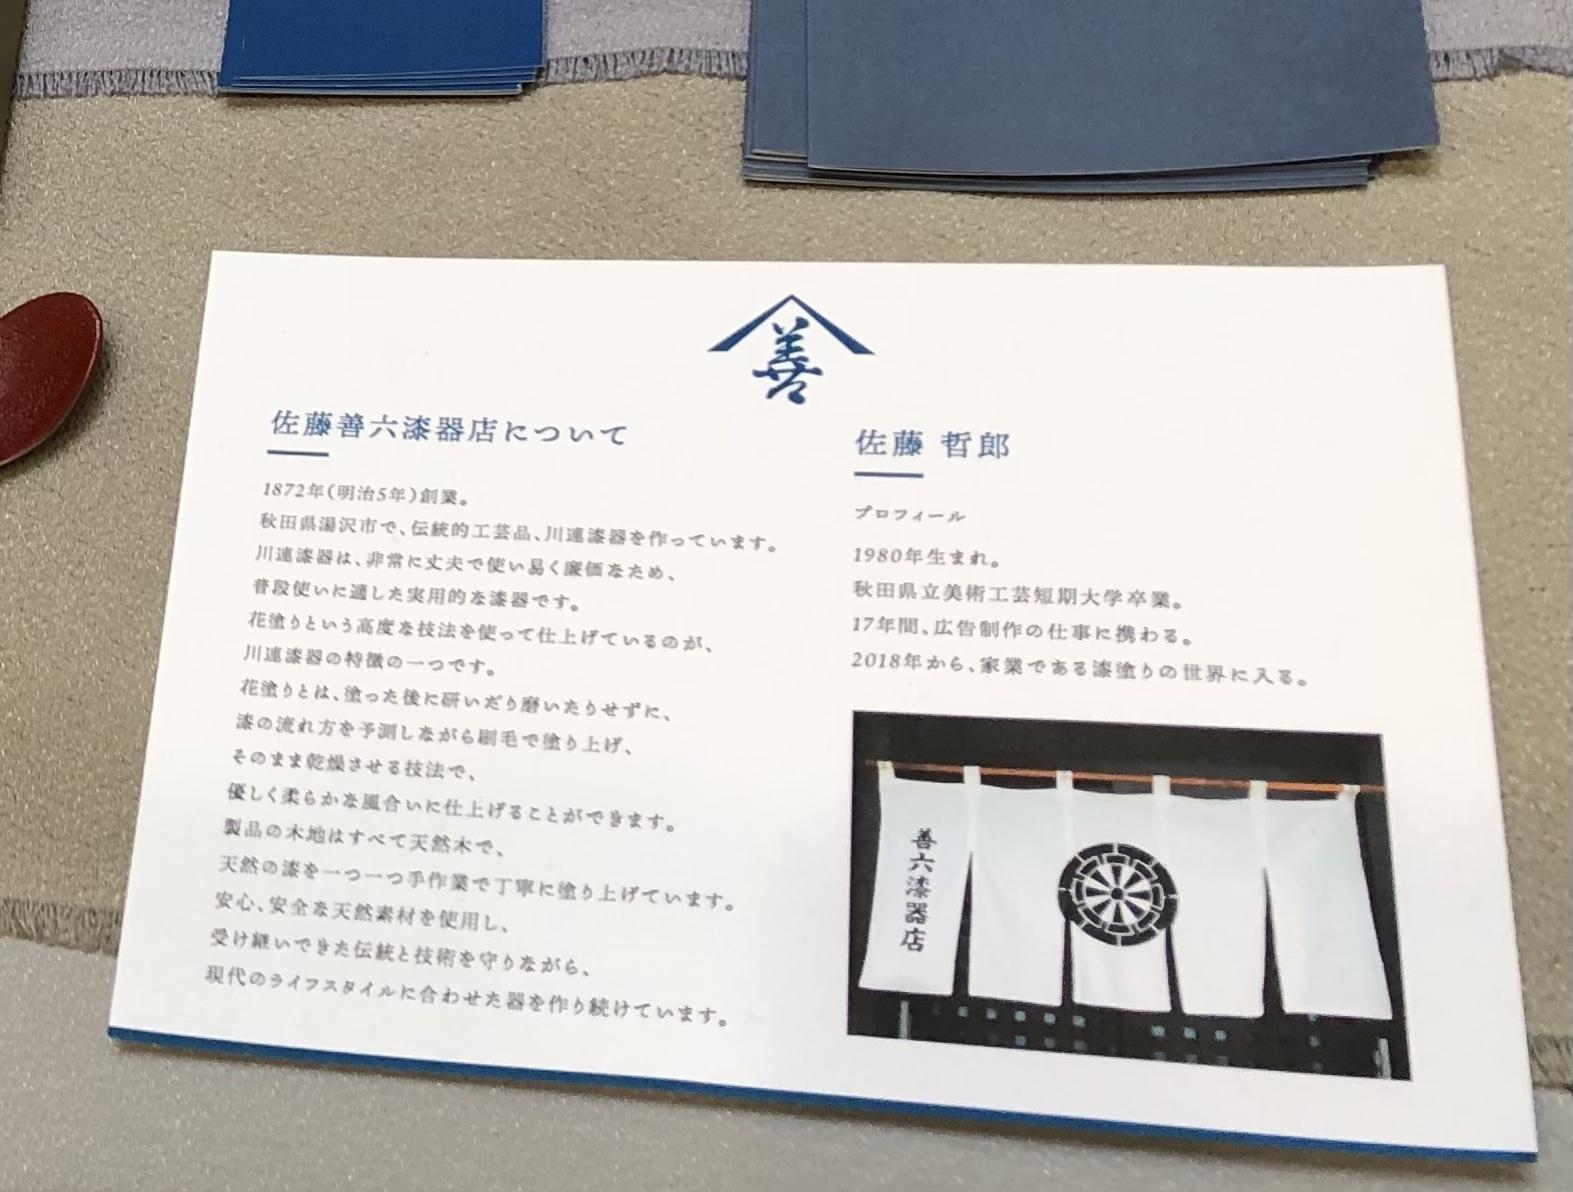 川連漆器青年会展示会 始動! 2021 その2_f0319699_20155697.jpeg